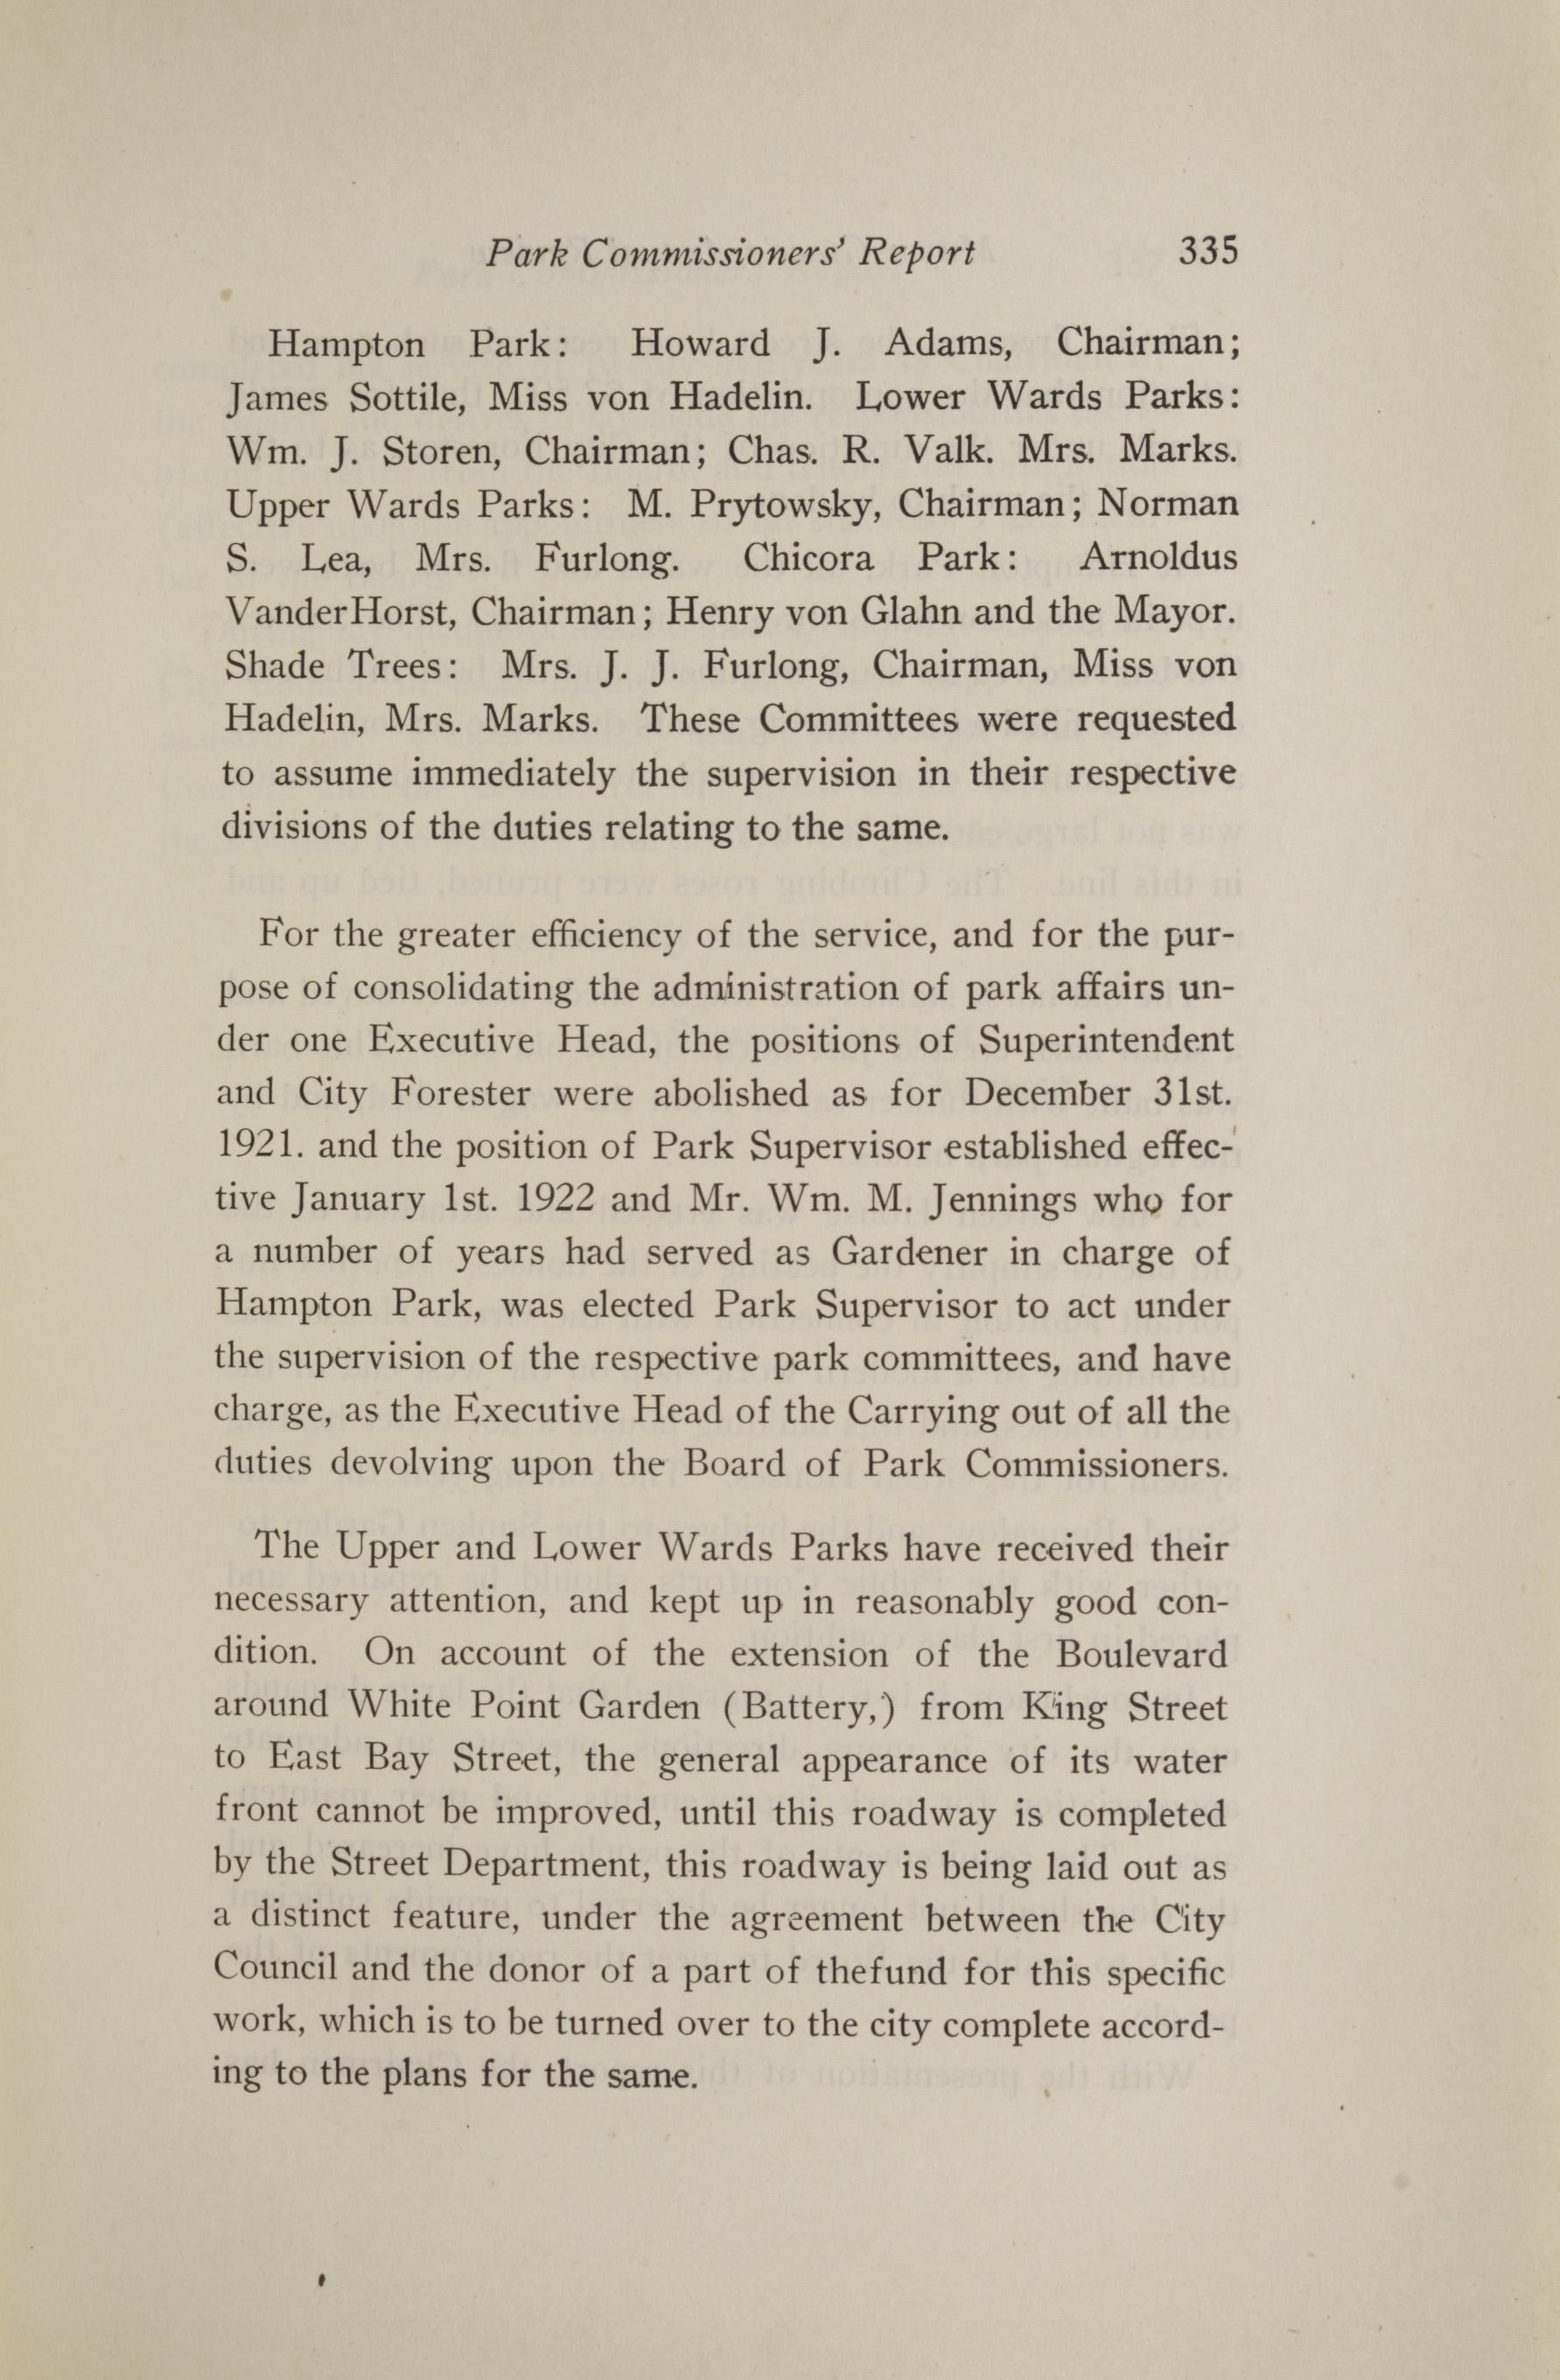 Charleston Yearbook, 1921, page 335